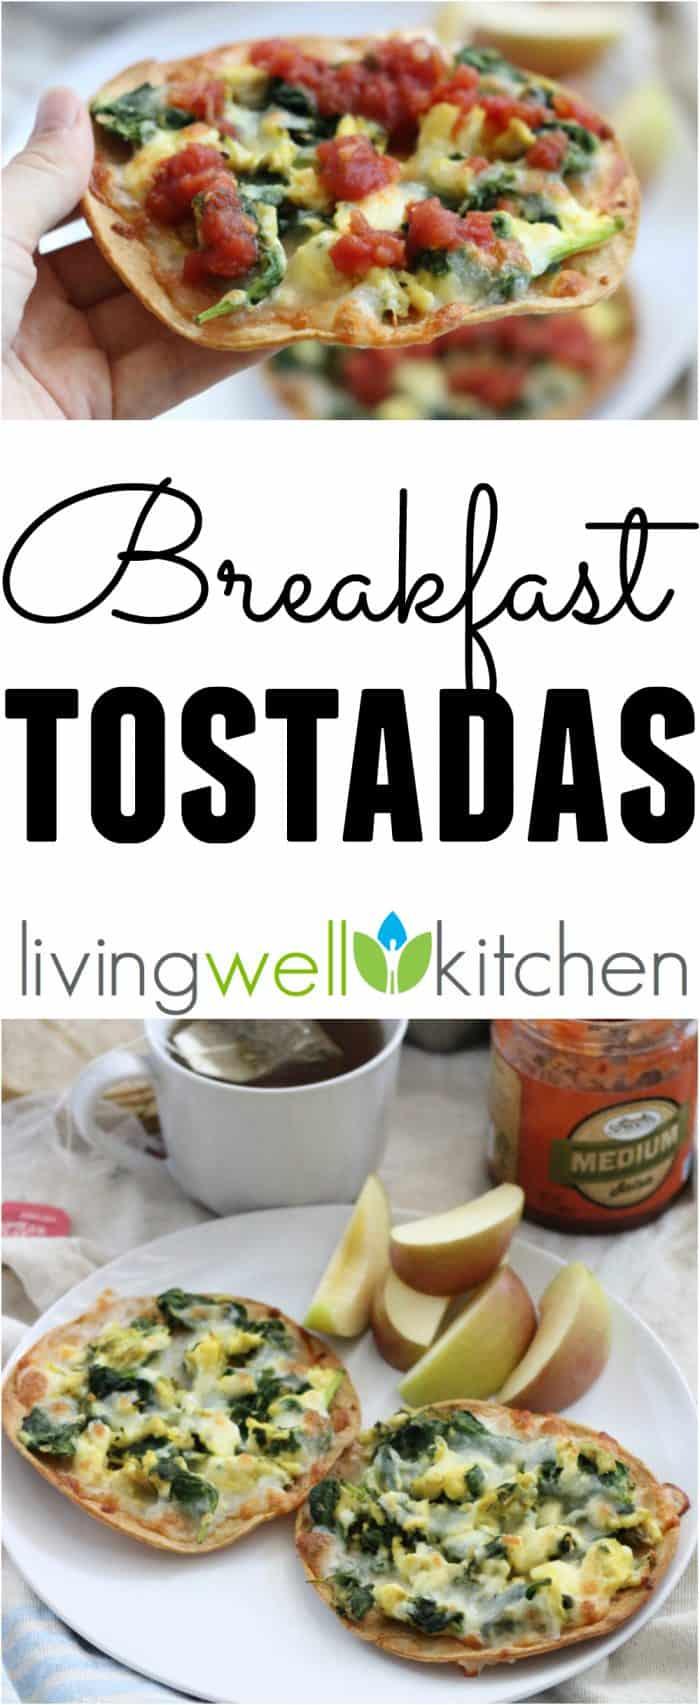 Skip the restaurant for these crispyveggie-packed and healthy breakfast tostadas. This Breakfast Tostadas recipe is a tasty gluten free breakfast or dinner idea